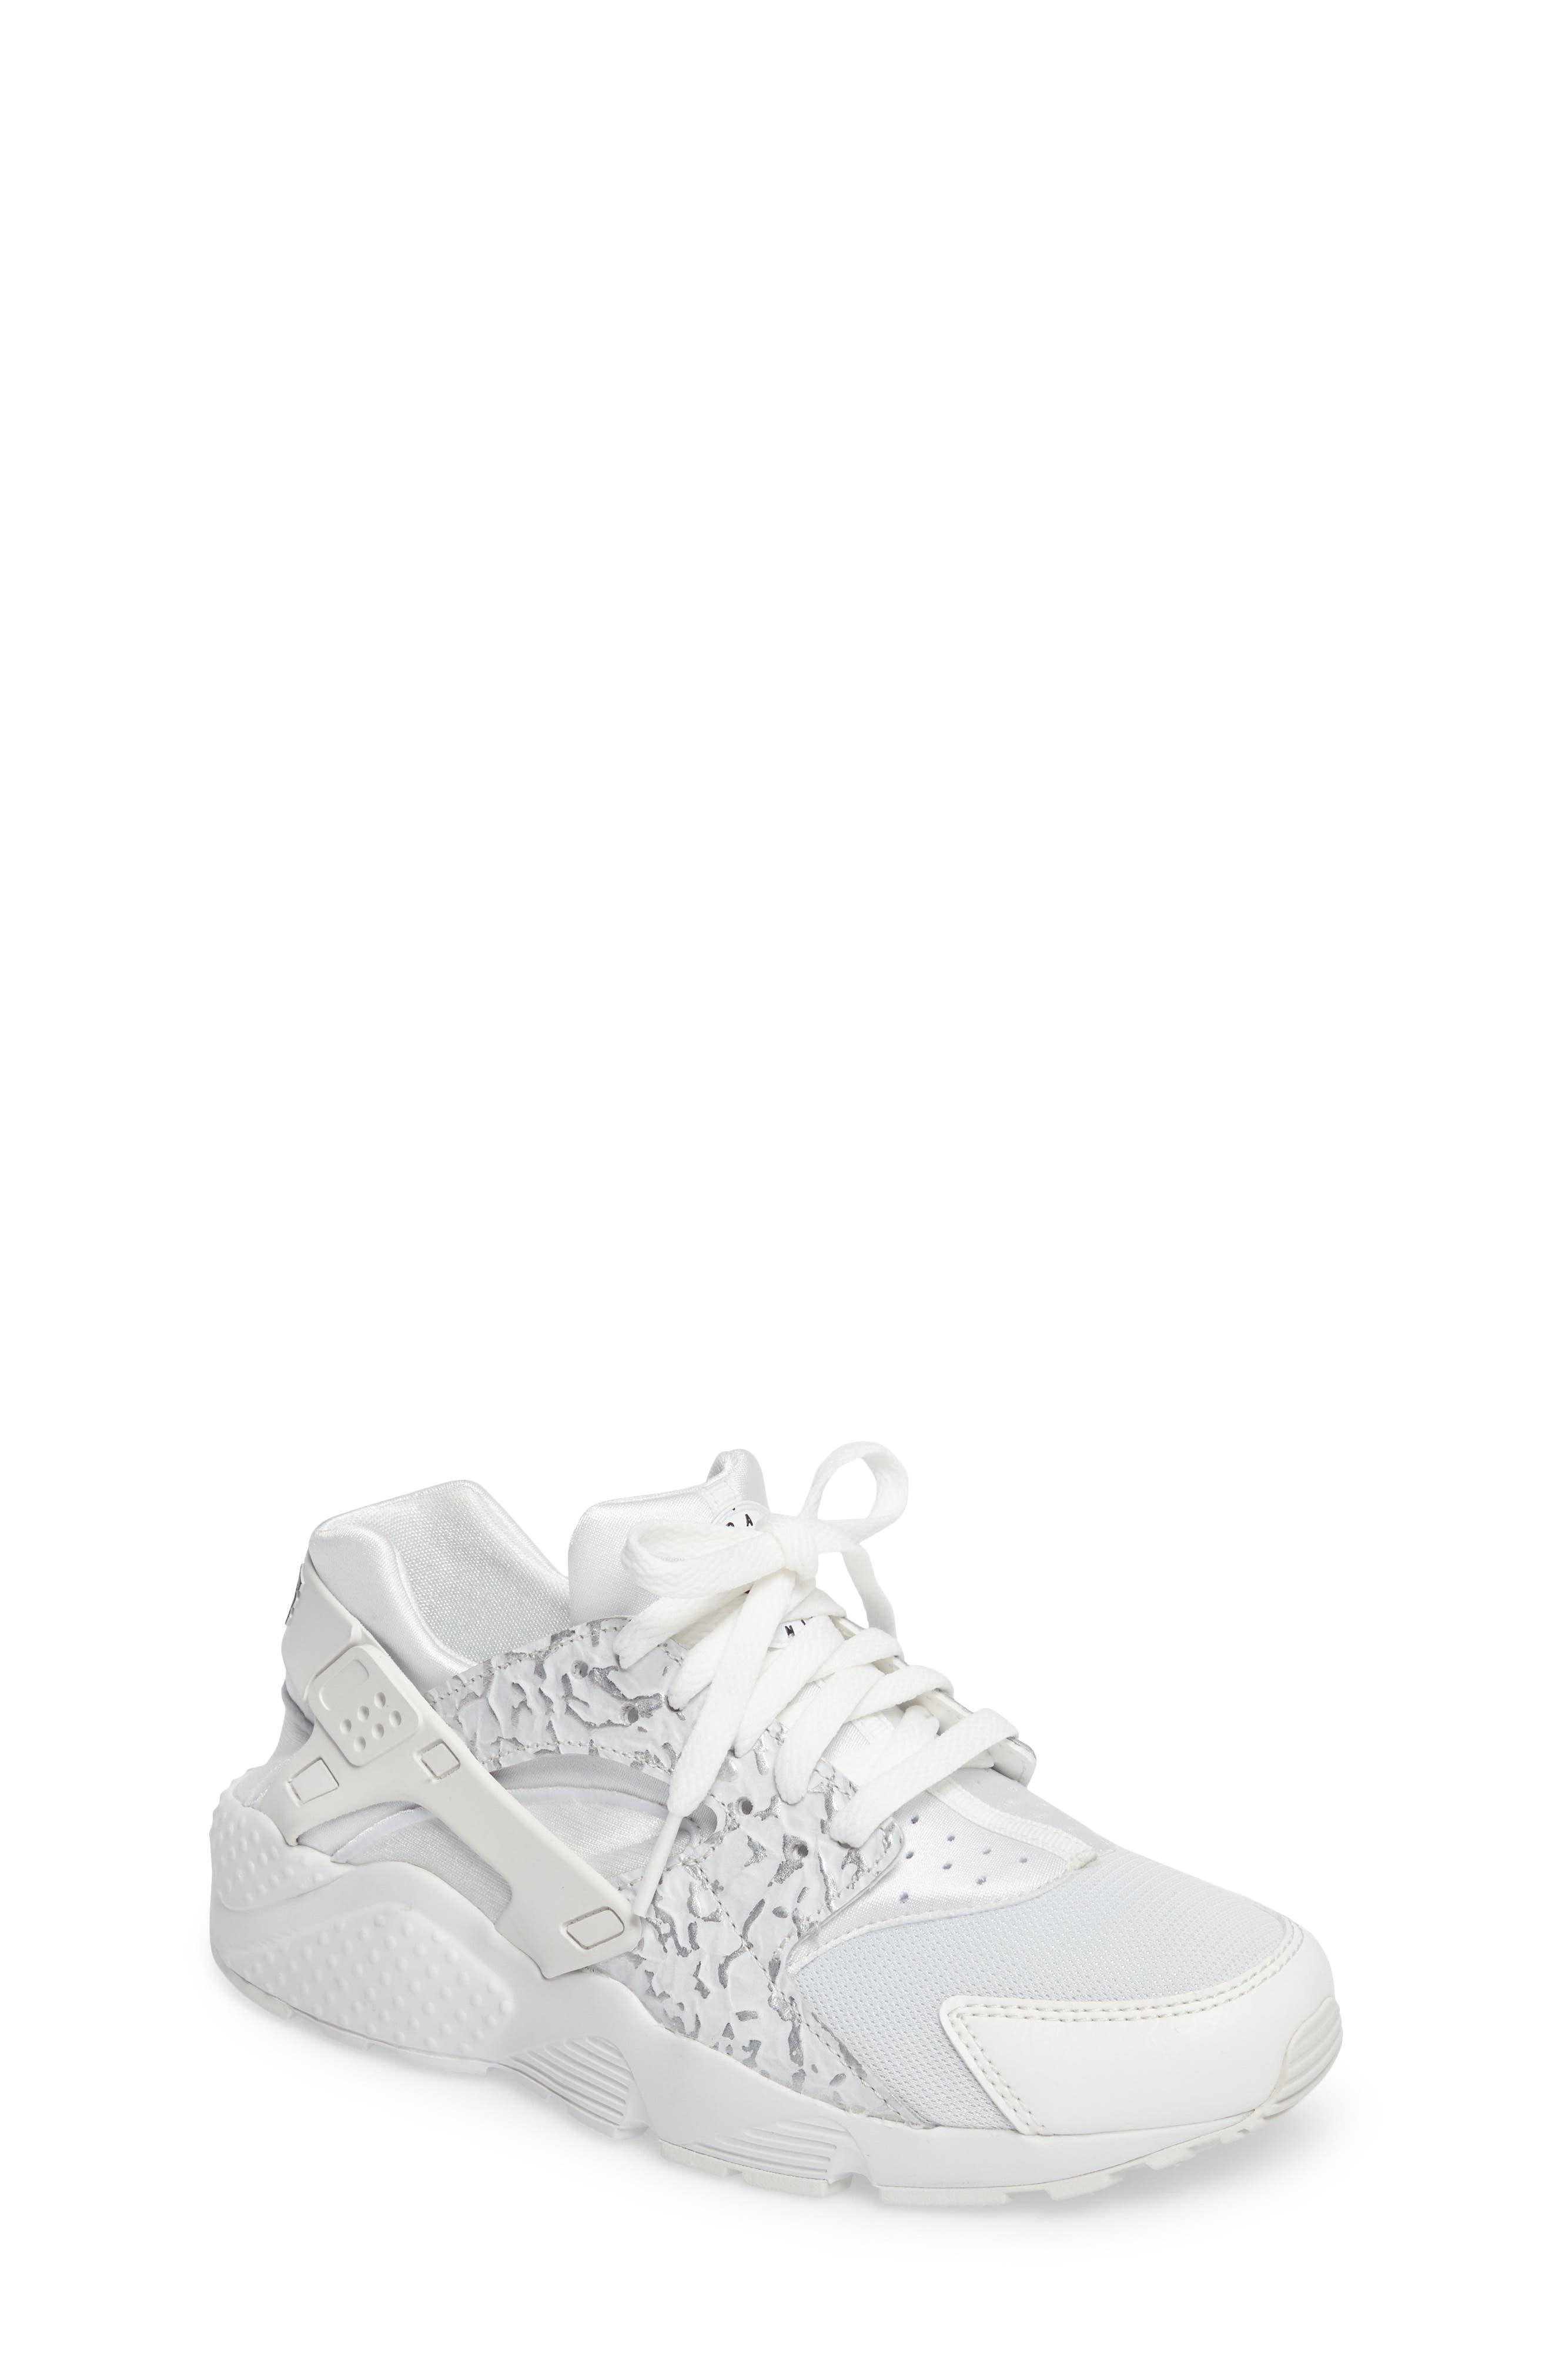 Nike Huarache Run SE Sneaker (Big Kid)